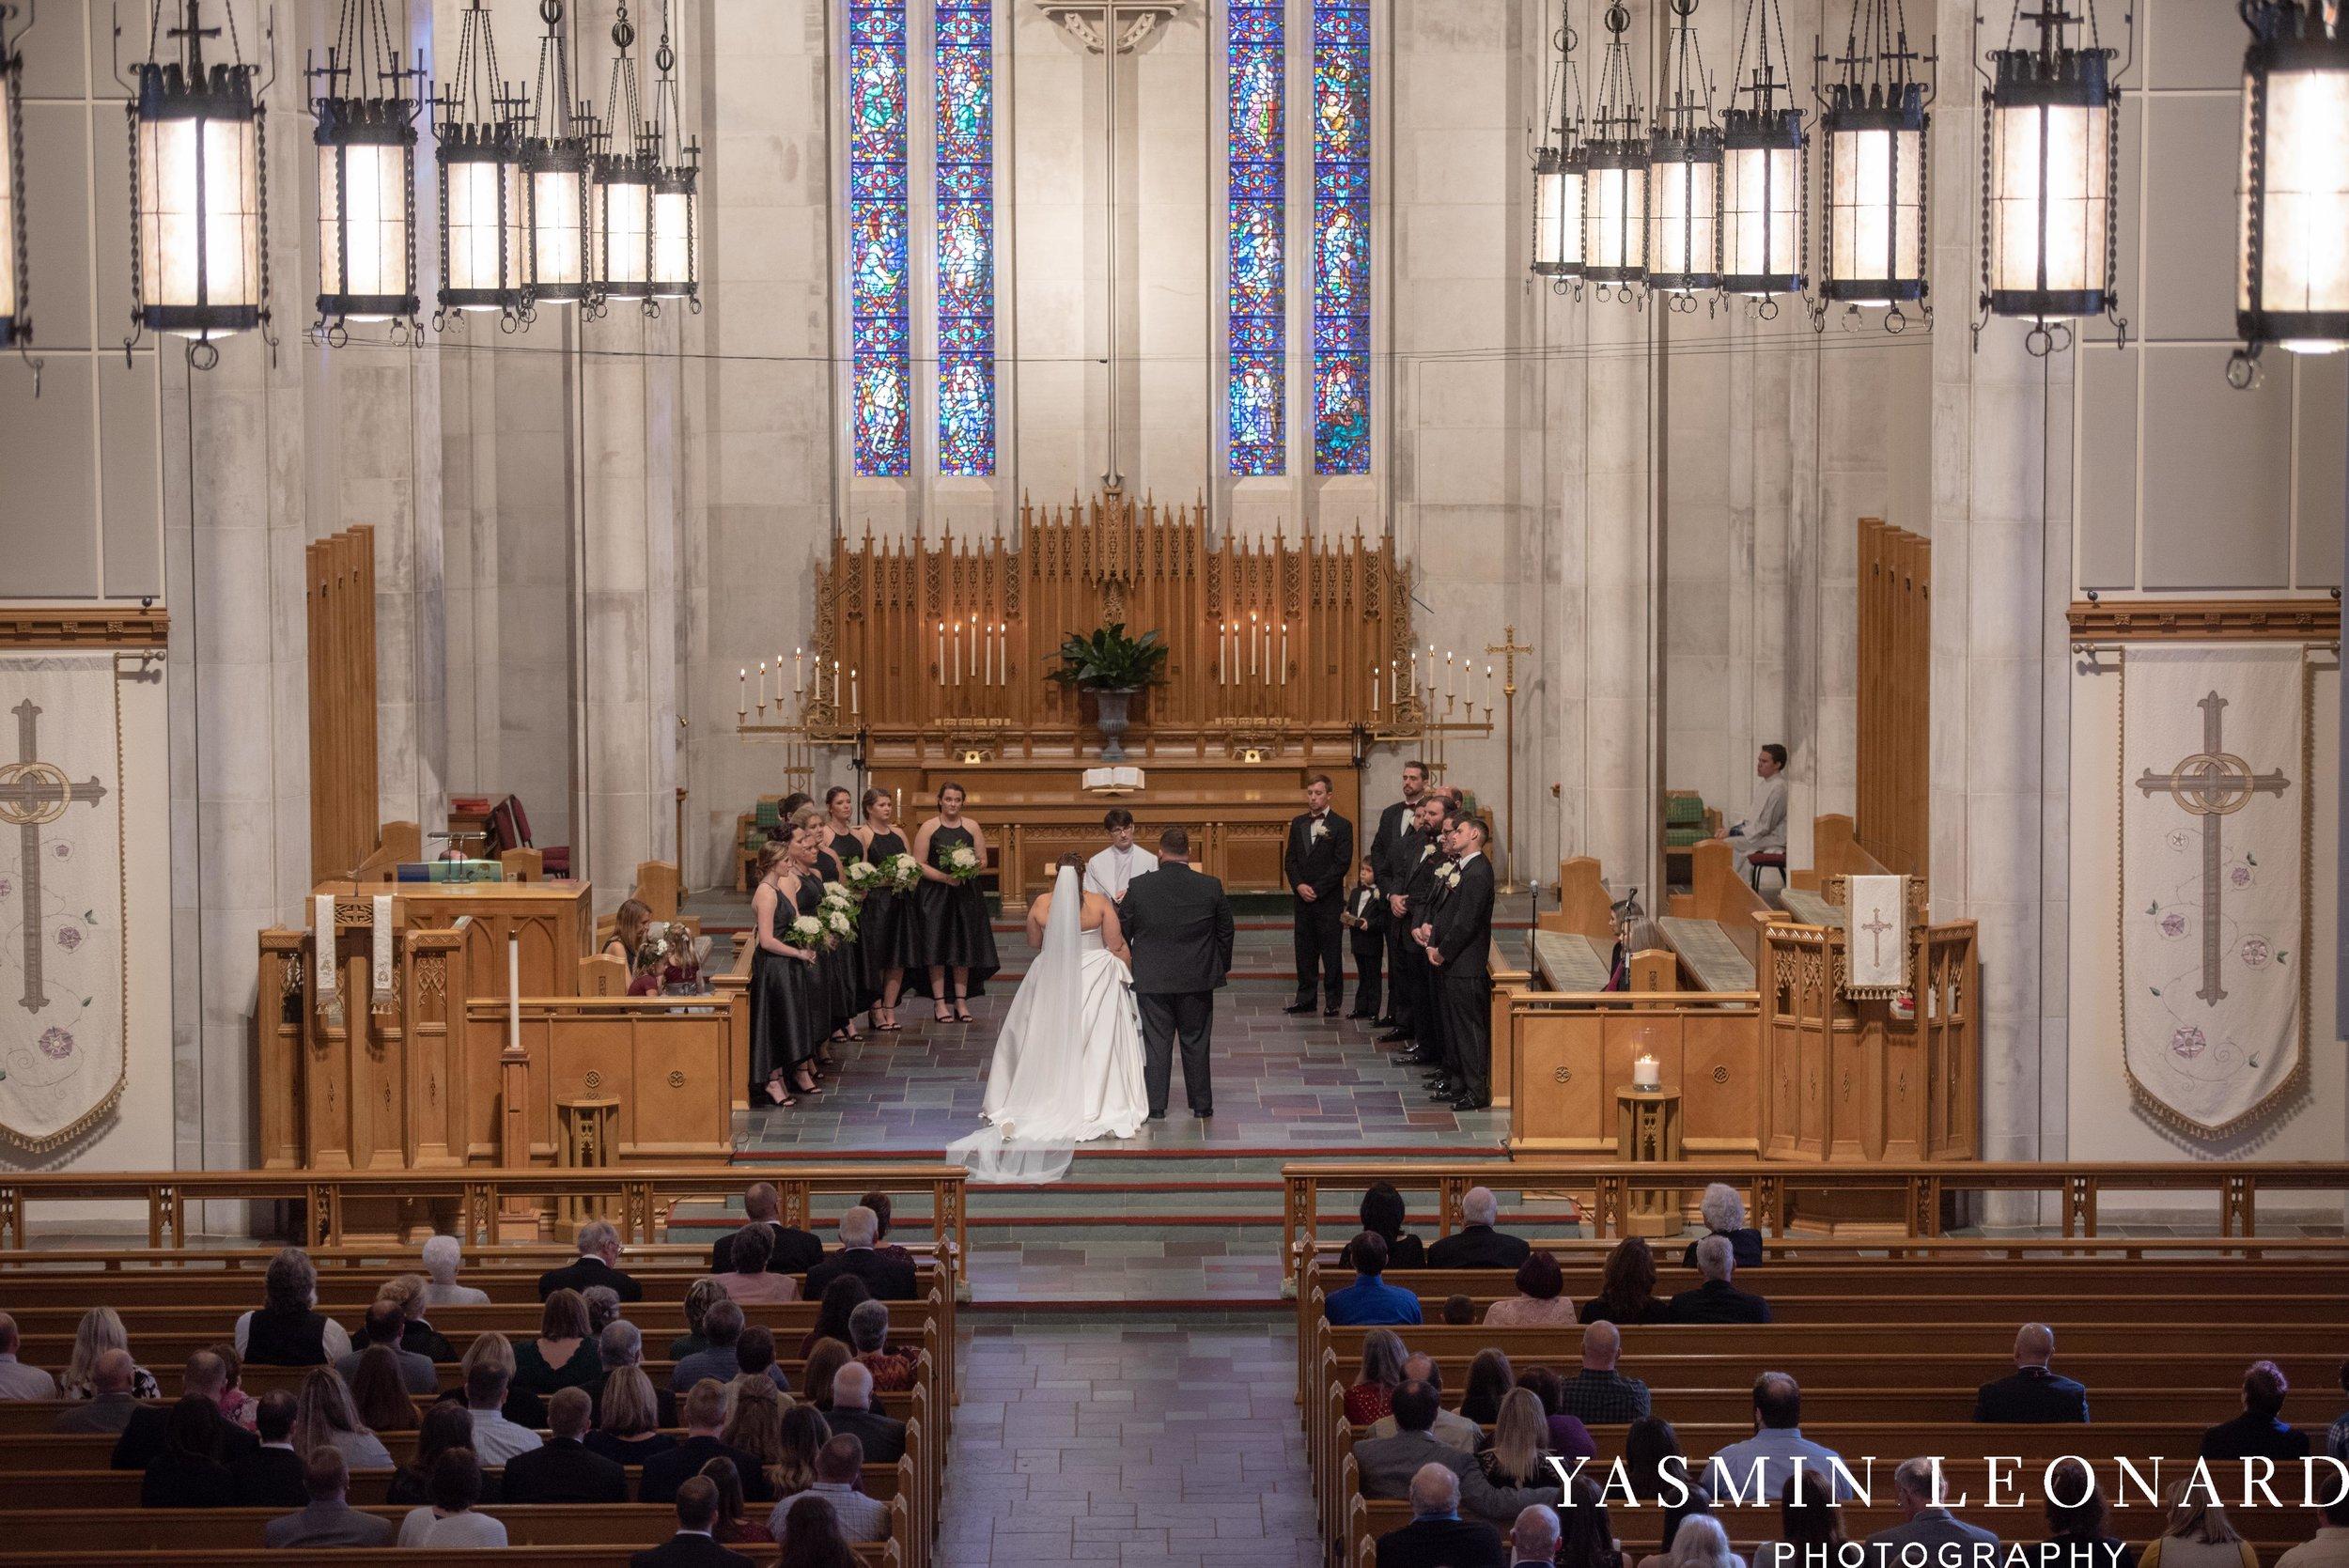 Wesley Memorial United Methodist Church - Old Homeplace Winery - High Point Weddings - High Point Wedding Photographer - NC Weddings - NC Barn Venue - Yasmin Leonard Photography-16.jpg